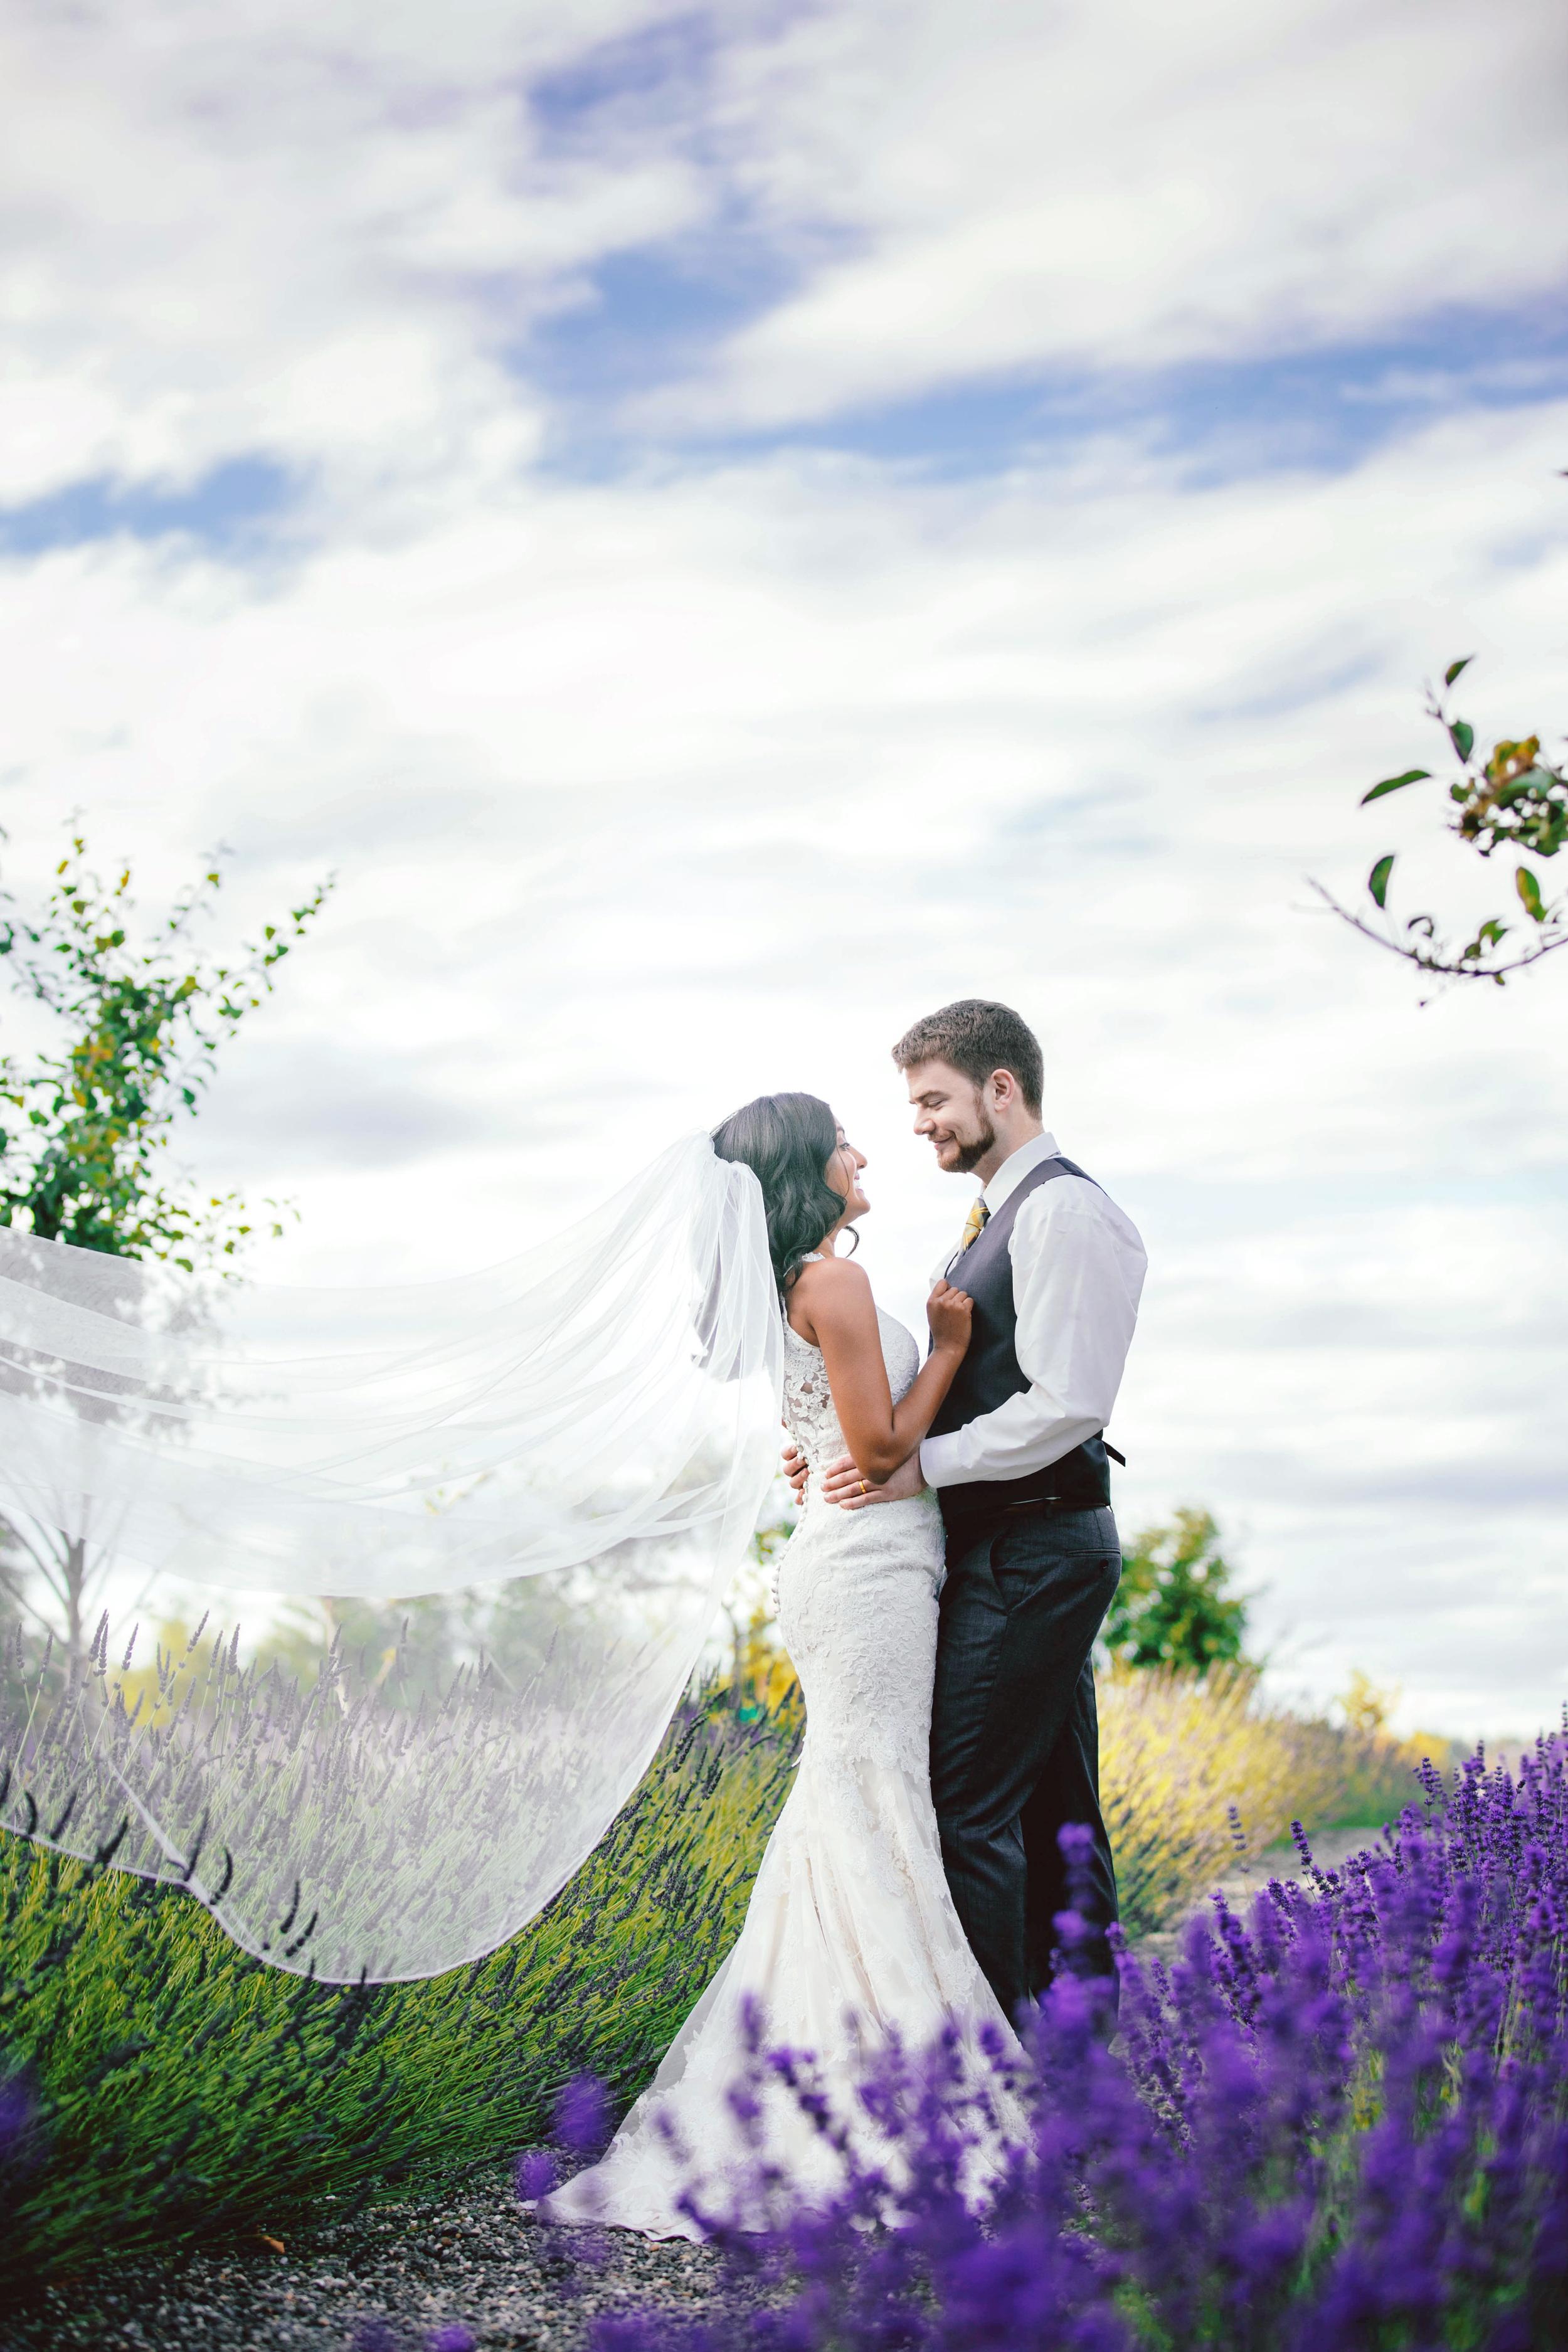 Hima+Dan_Wedding_Seattle+Couple_Kingston_6112016_6.jpg